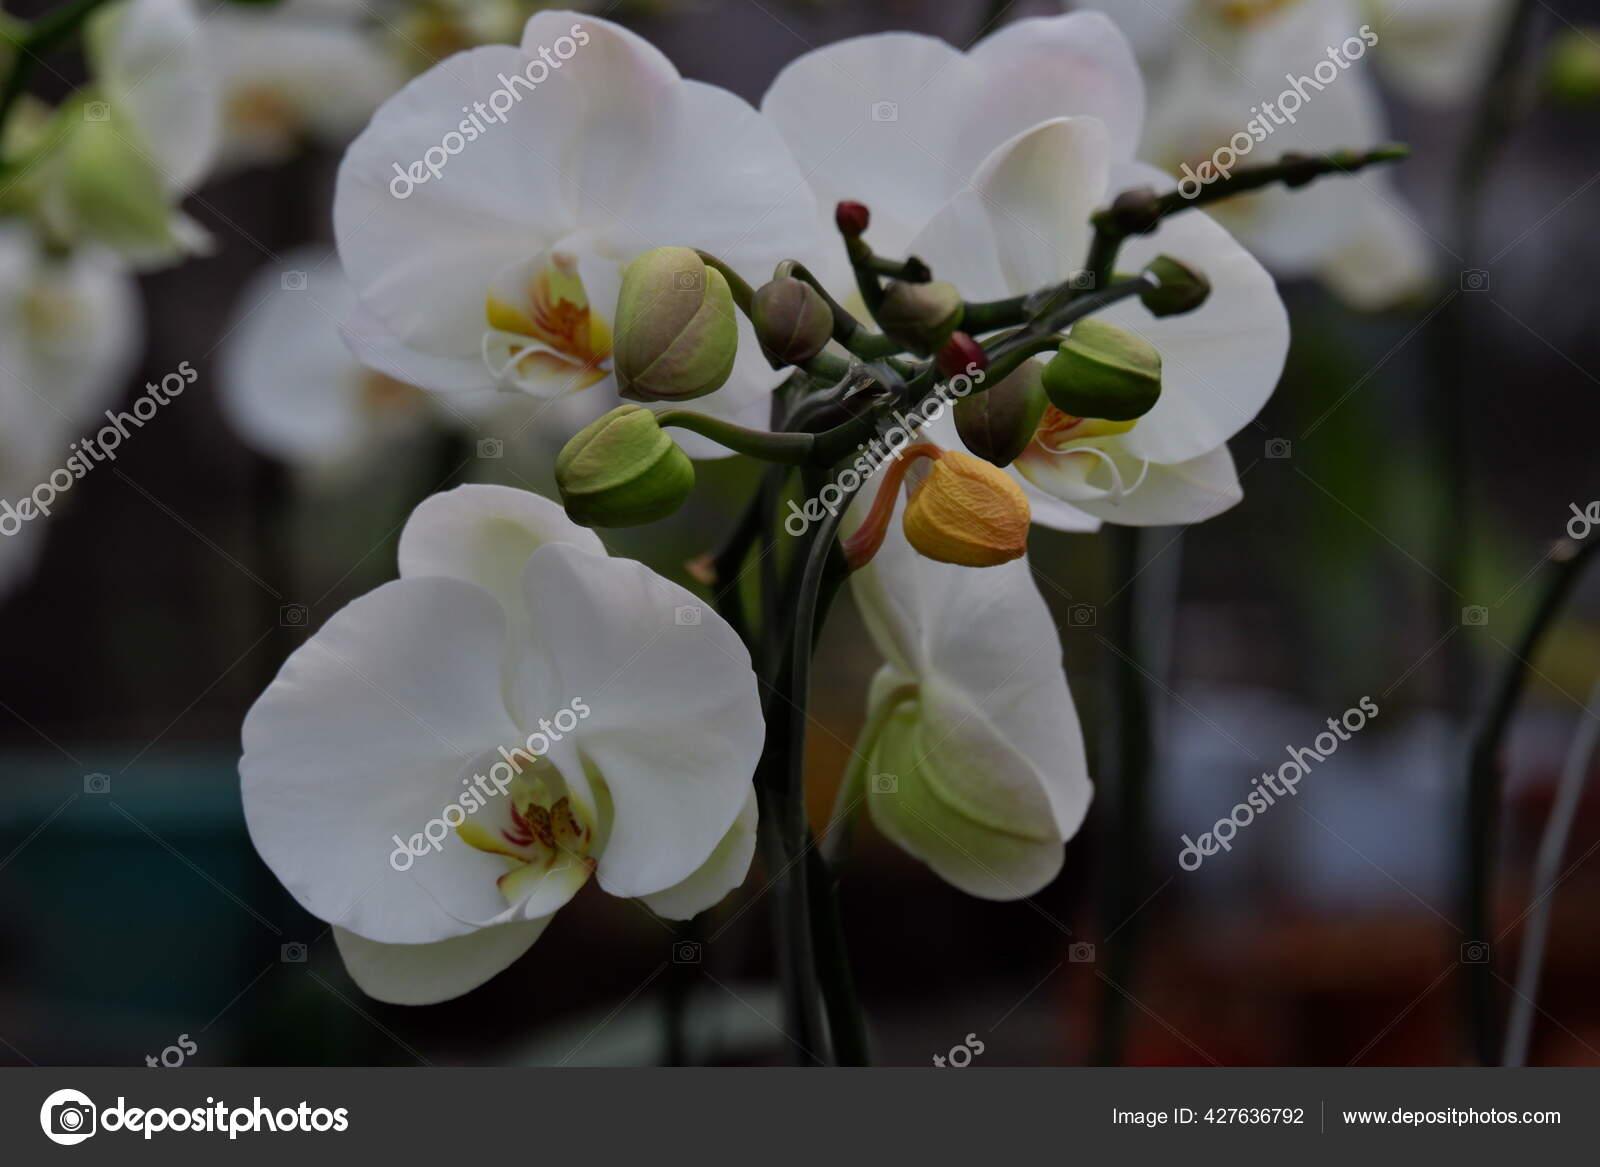 Bunga Anggrek Bulan Putih Pandangan Dekat Indah Putih Phalaenopsis Amabilis Stok Foto C Pengejarsenja Depositphoto Gmail Com 427636792